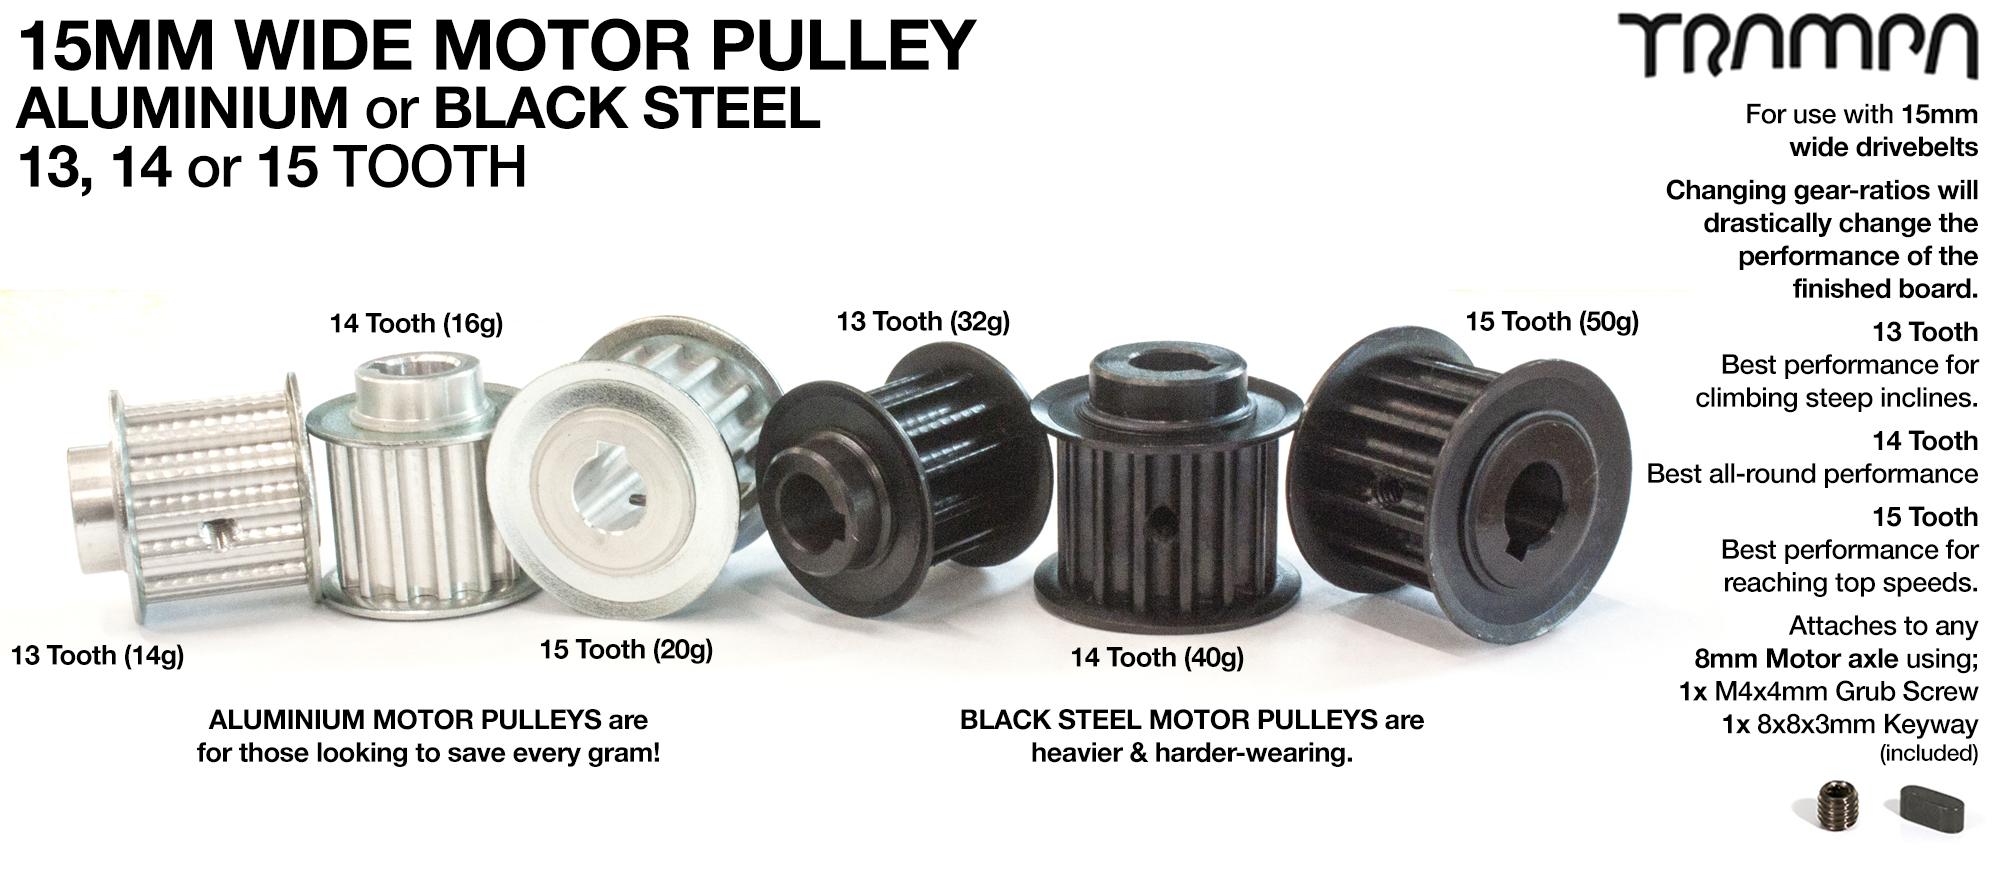 Custom choice Motor Pulley ALUMINIUM or BLACK STEEL & supplied with MGSS Grub Screw & Keyway - 13, 14, 15 tooth.